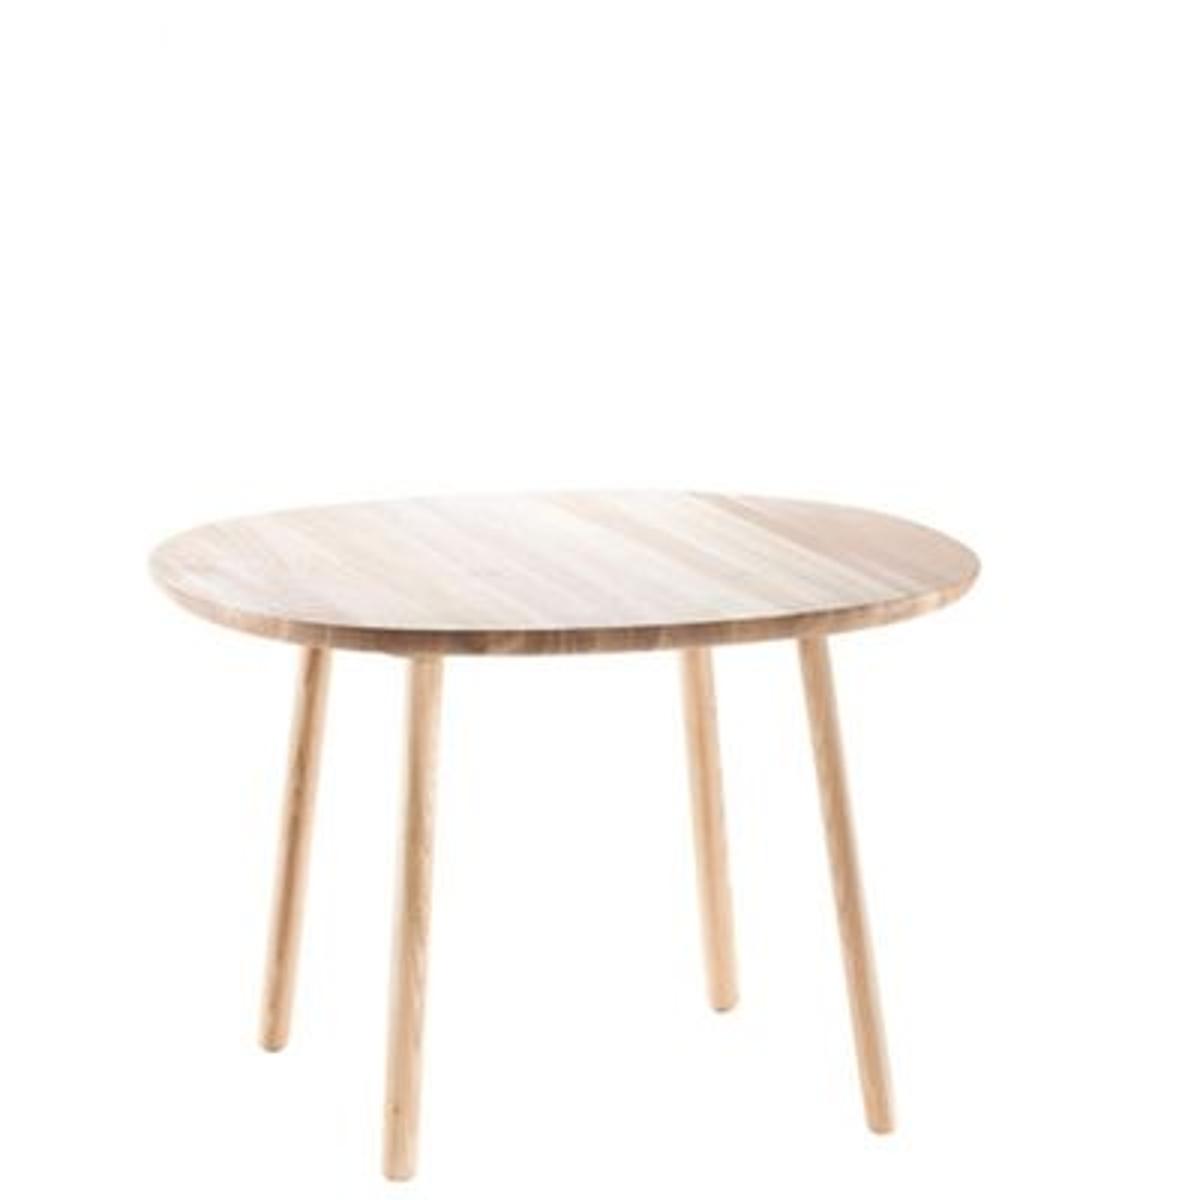 NAIVE - table ø 110 cm